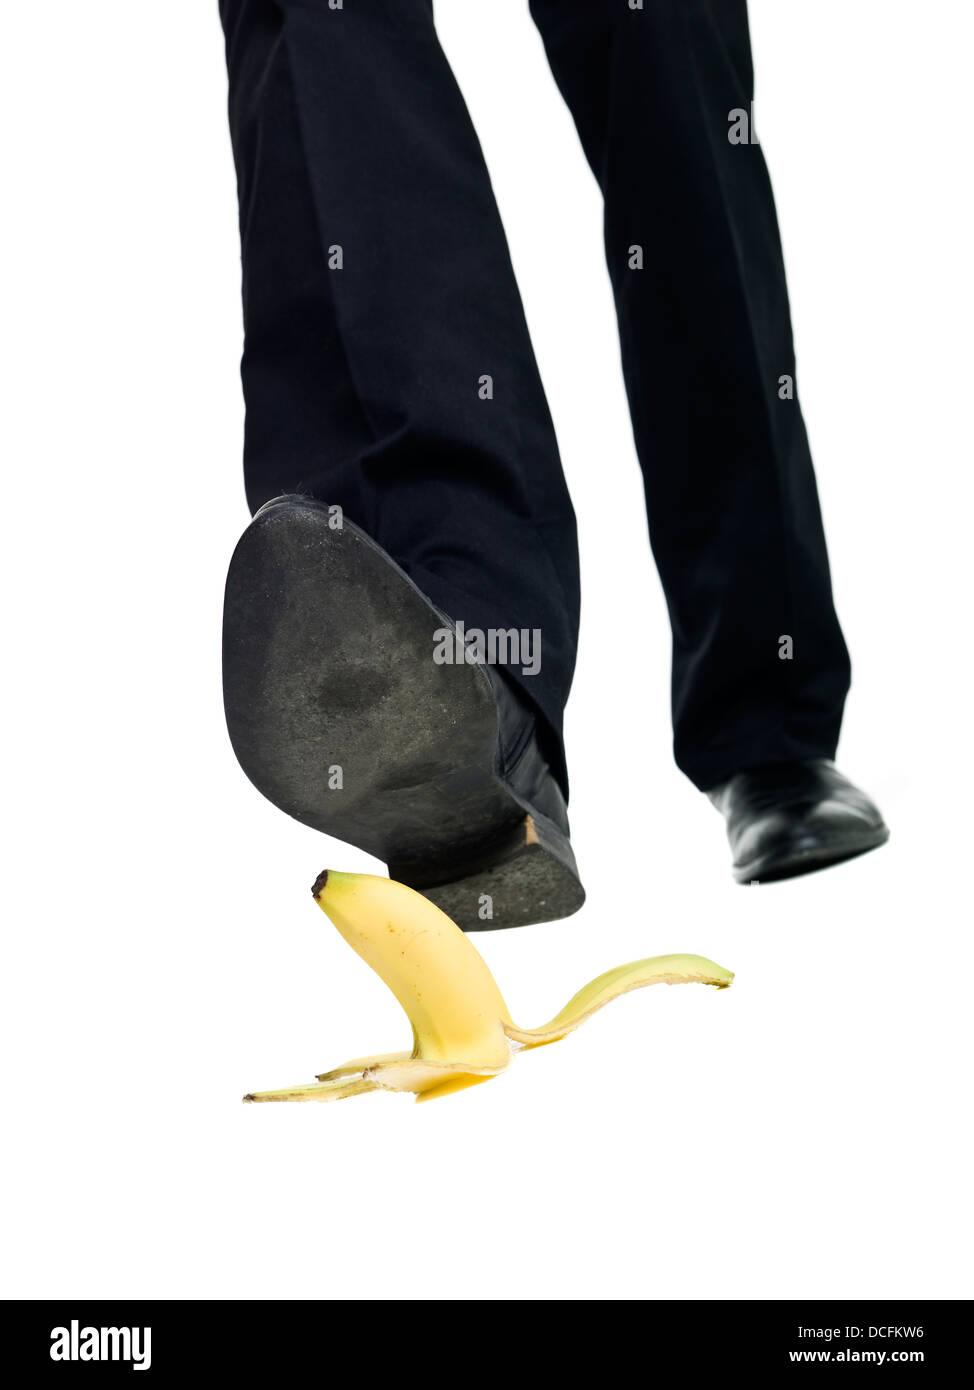 Banana peel slip - Stock Image